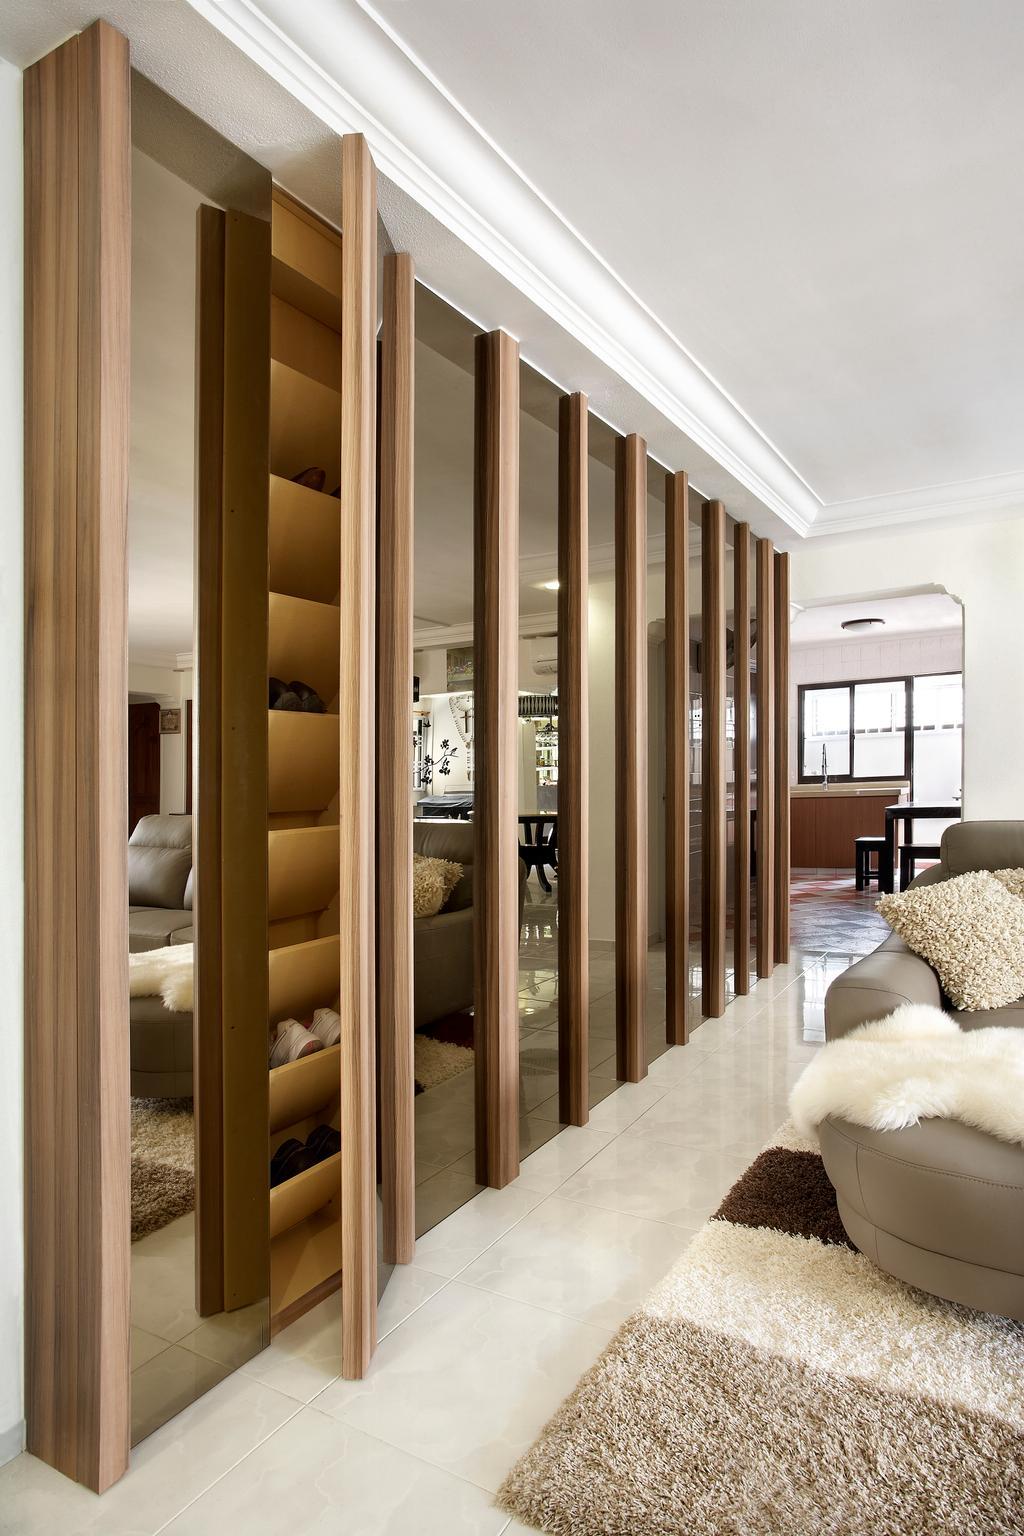 Modern, HDB, Living Room, Hougang, Interior Designer, I-Bridge Design, Cabinets, Storage, Hidden, Tiles, Carpet, Sofa, Mirror, Shoe Storage, Luxe, Elegant, Bedroom, Indoors, Interior Design, Room, Door, Folding Door